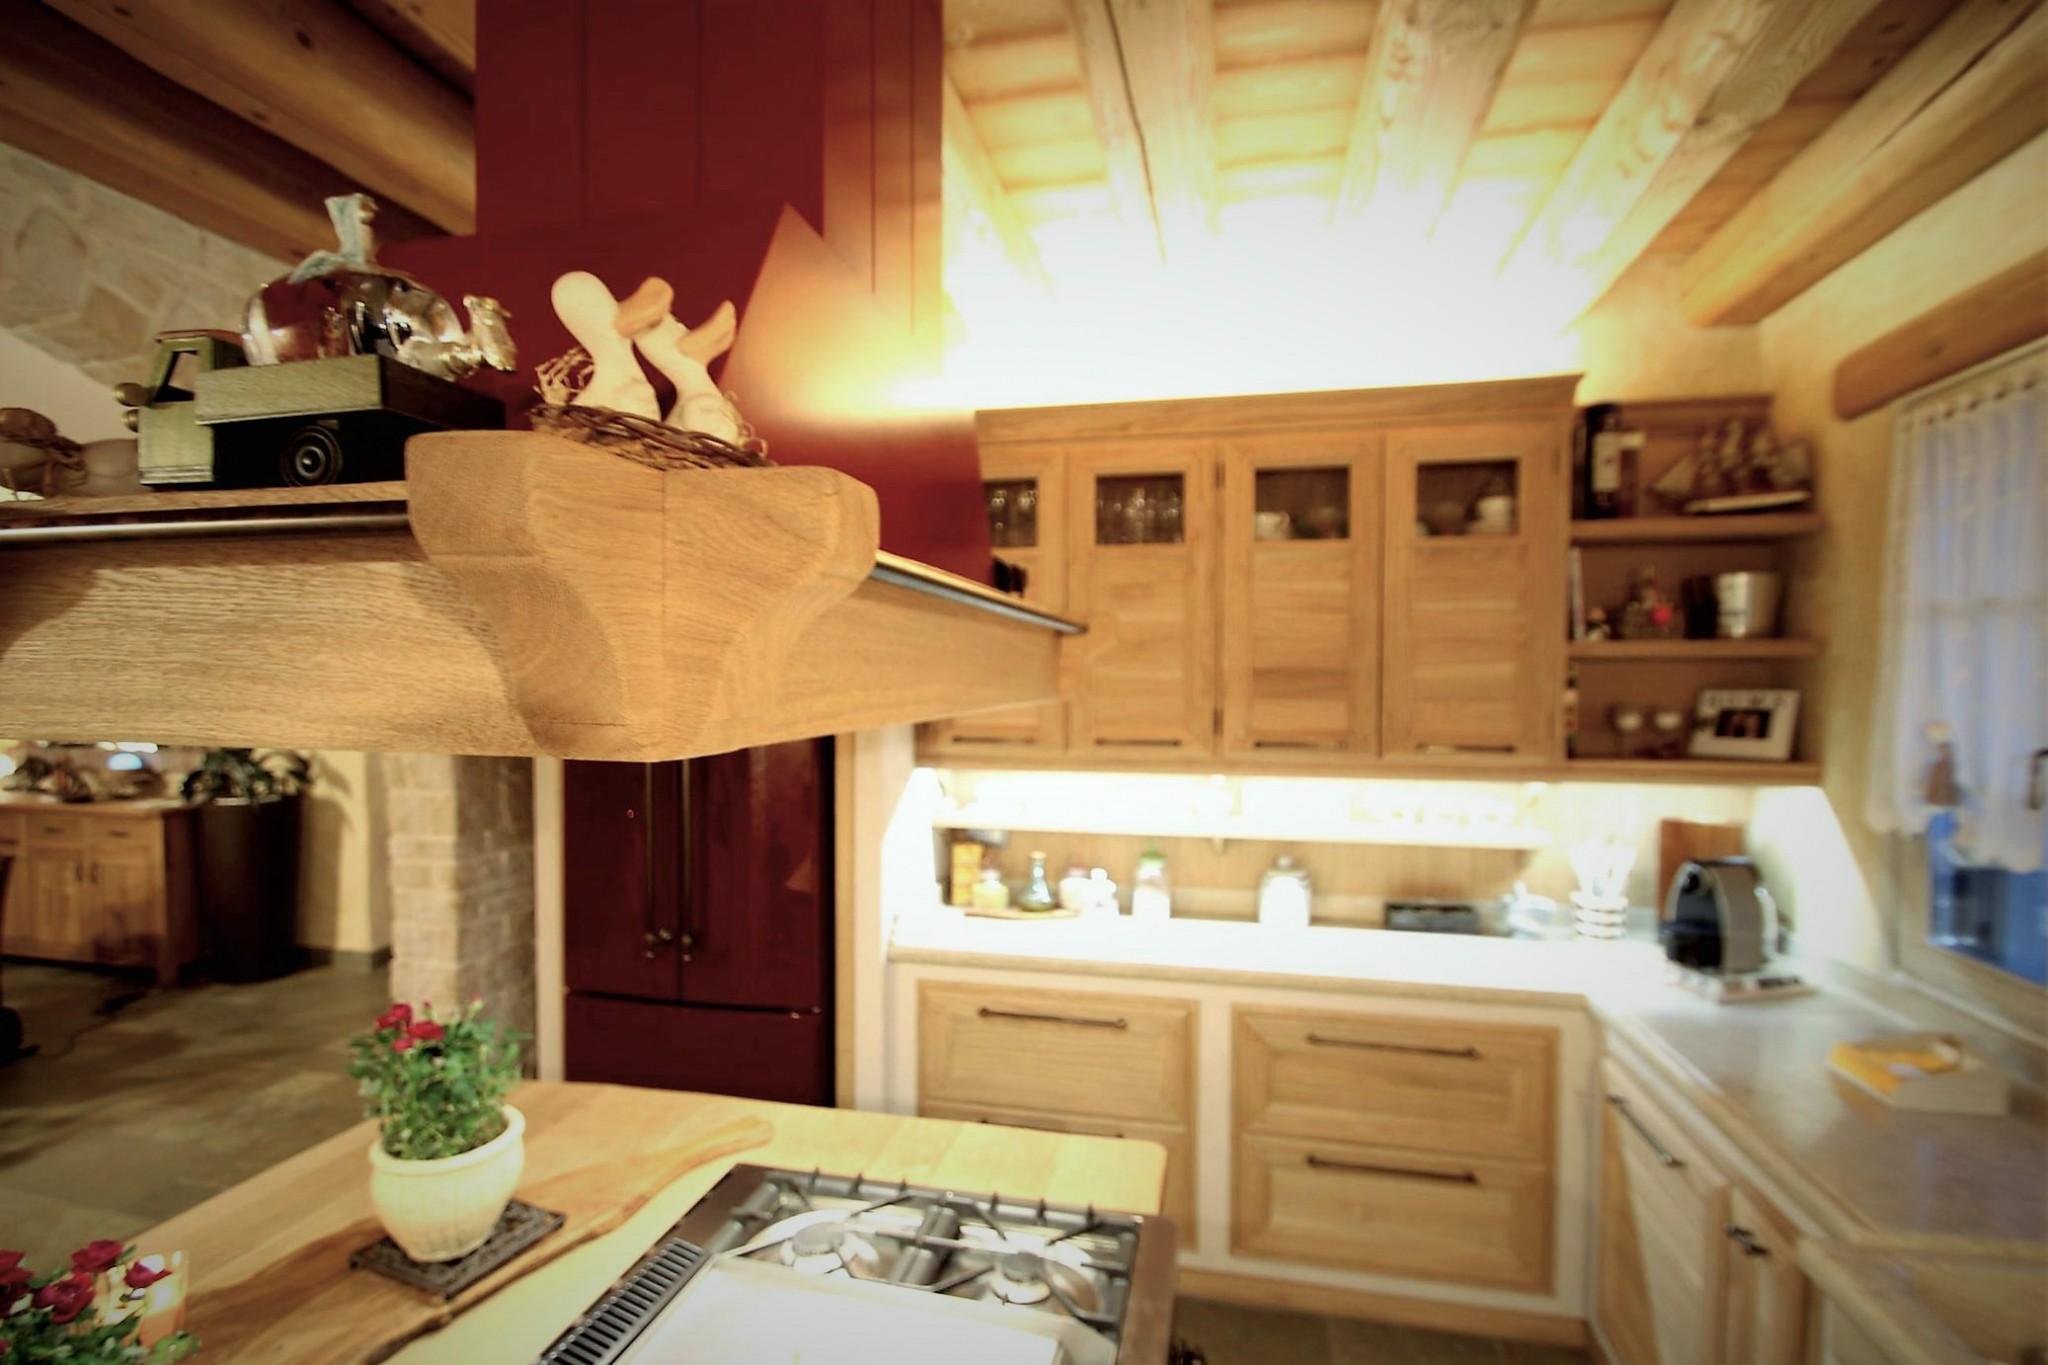 Squarcina | Cucina Stile Country - Squarcina